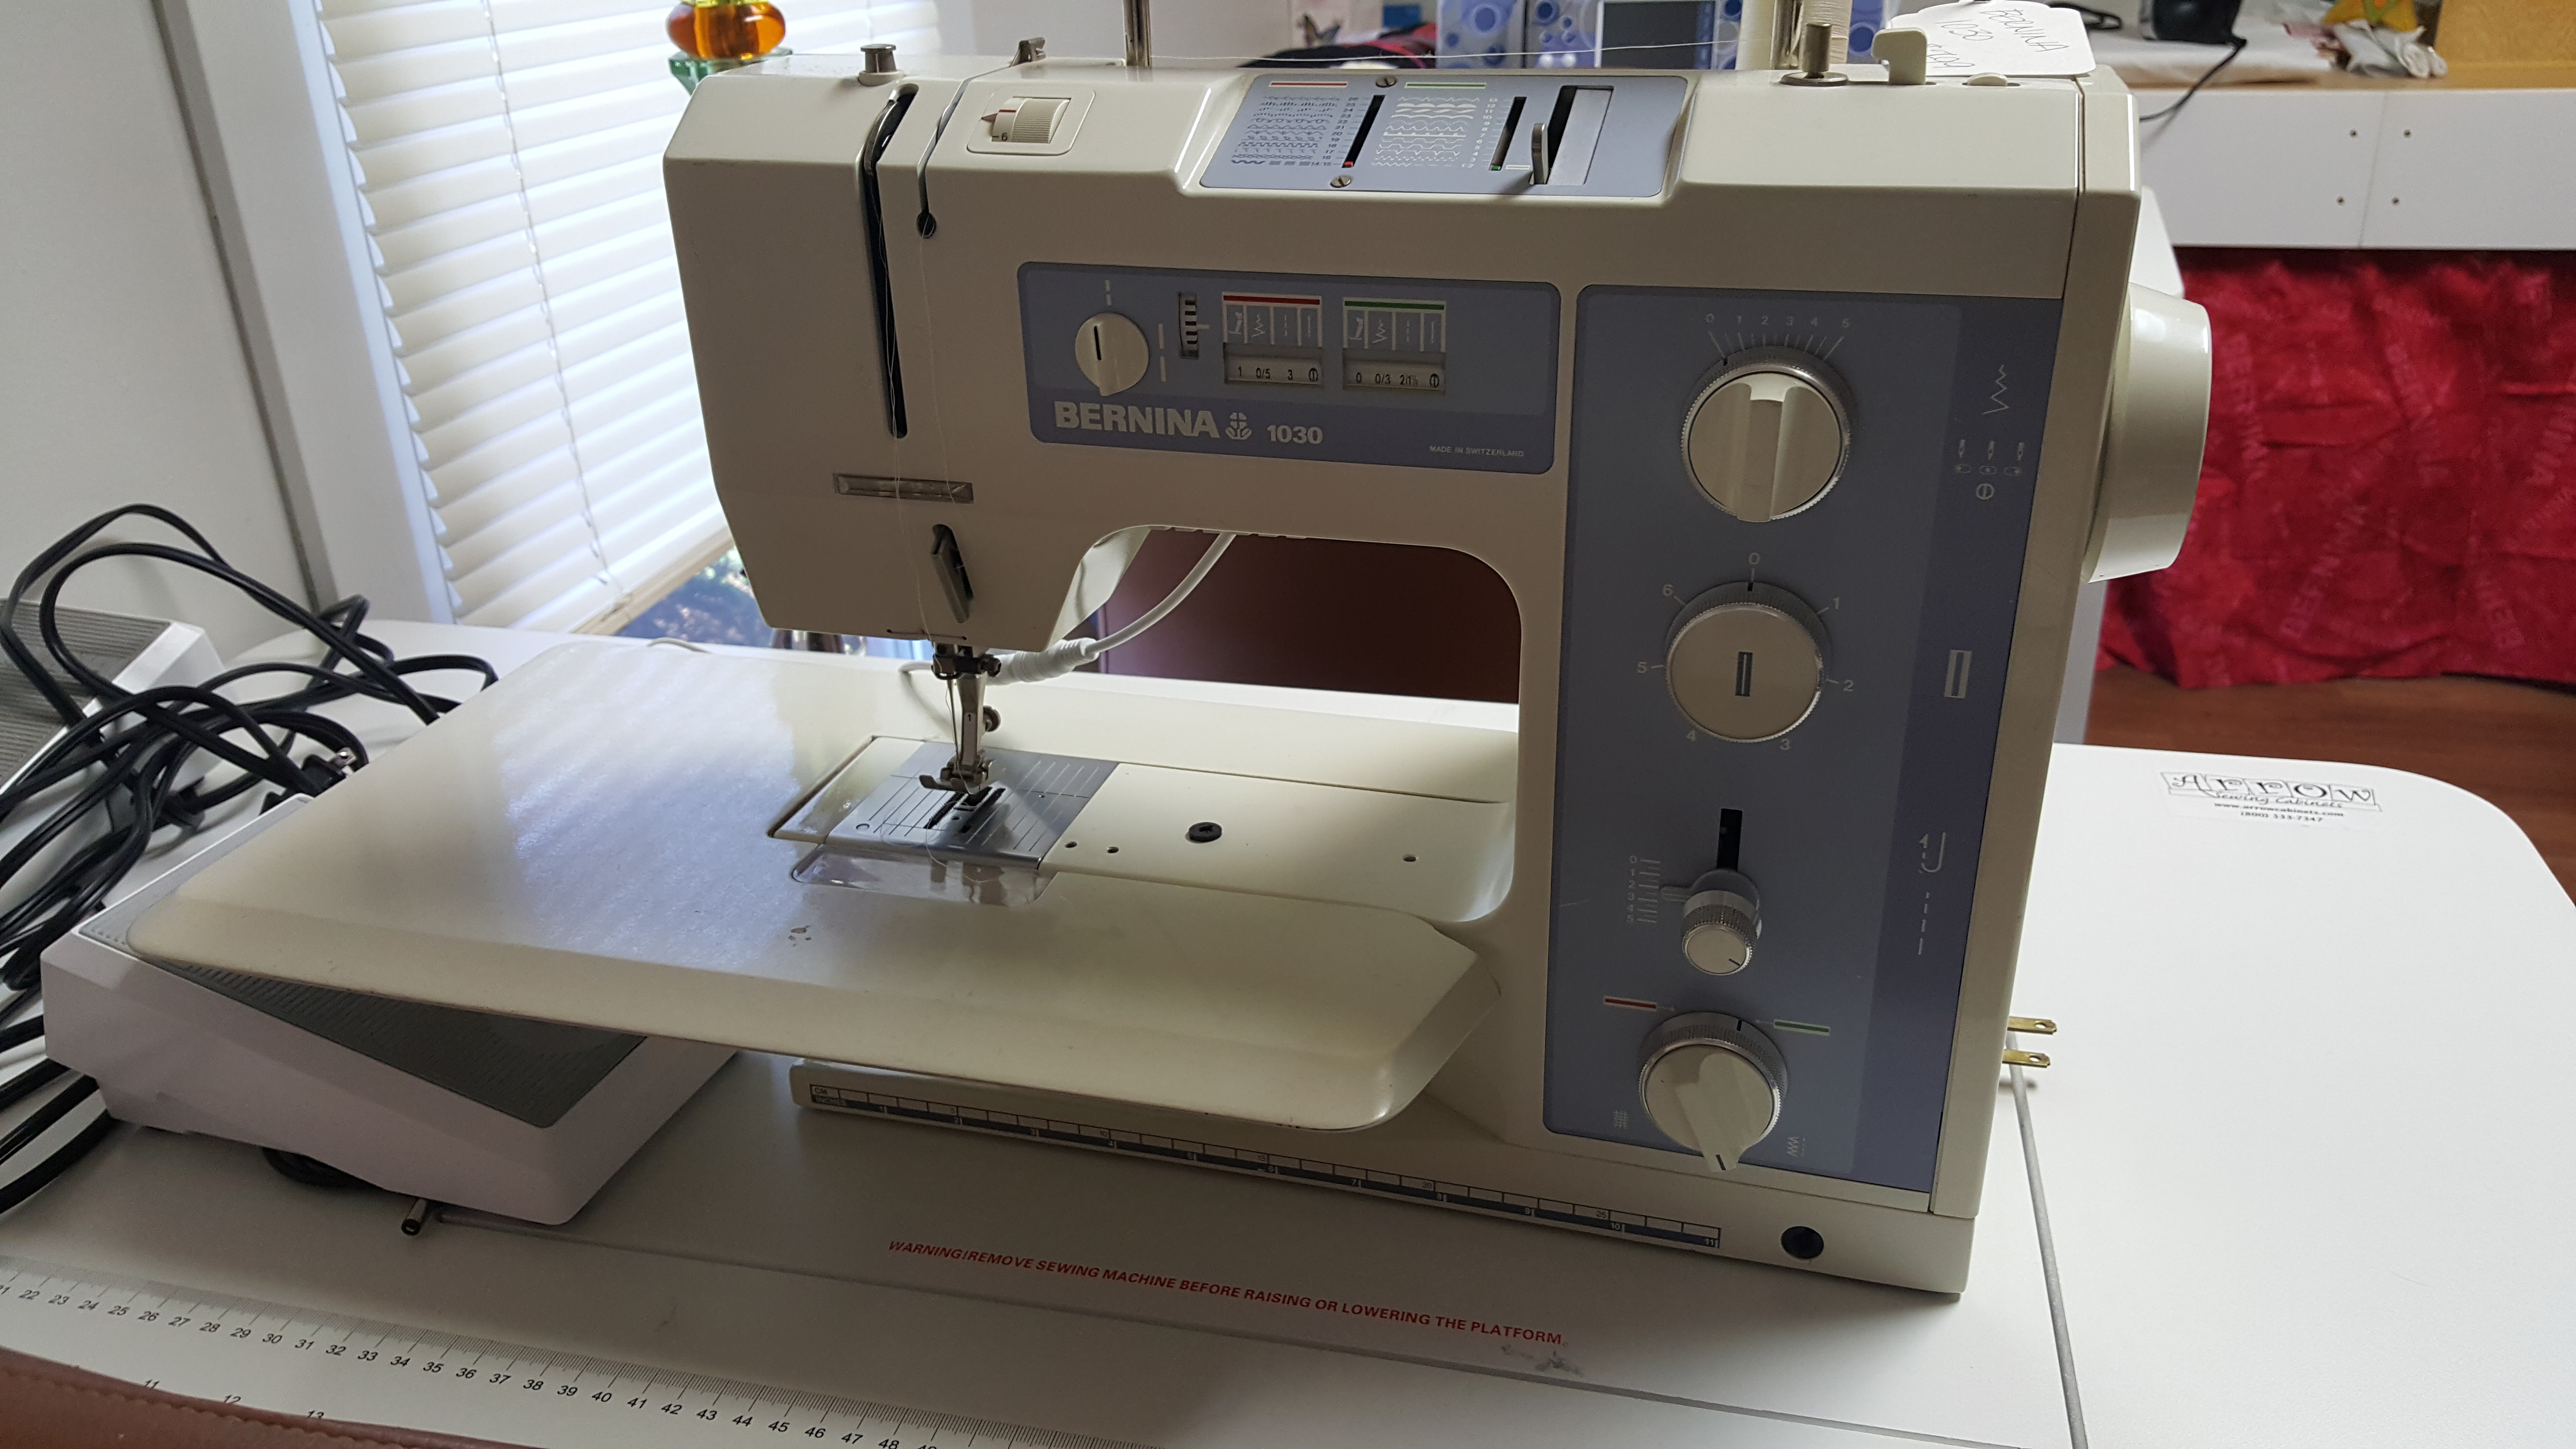 Bernina 1030 Sewing Machine